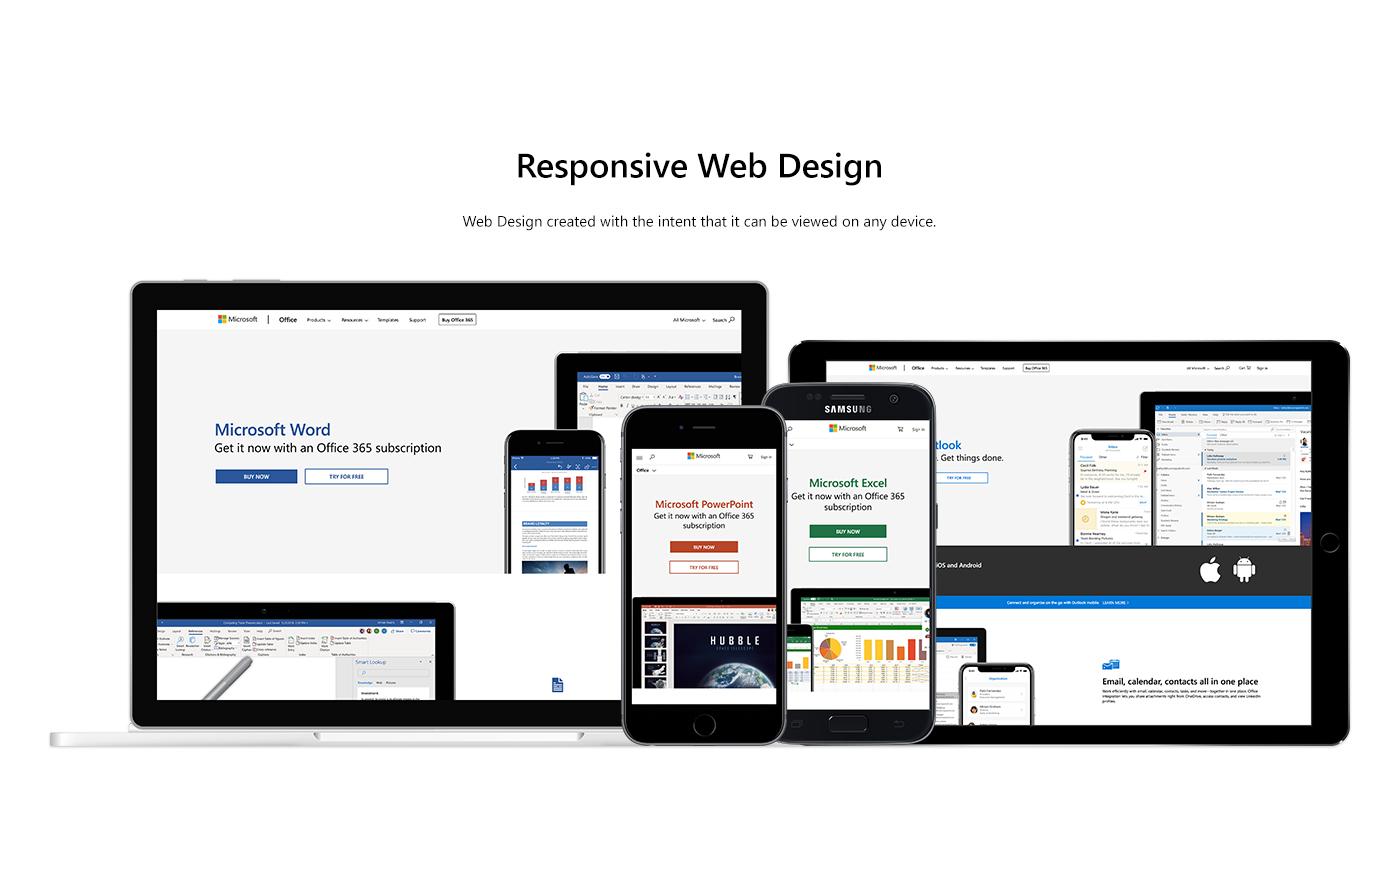 MicrosoftOffice_Responsive-Web-Design_4-Up.jpg